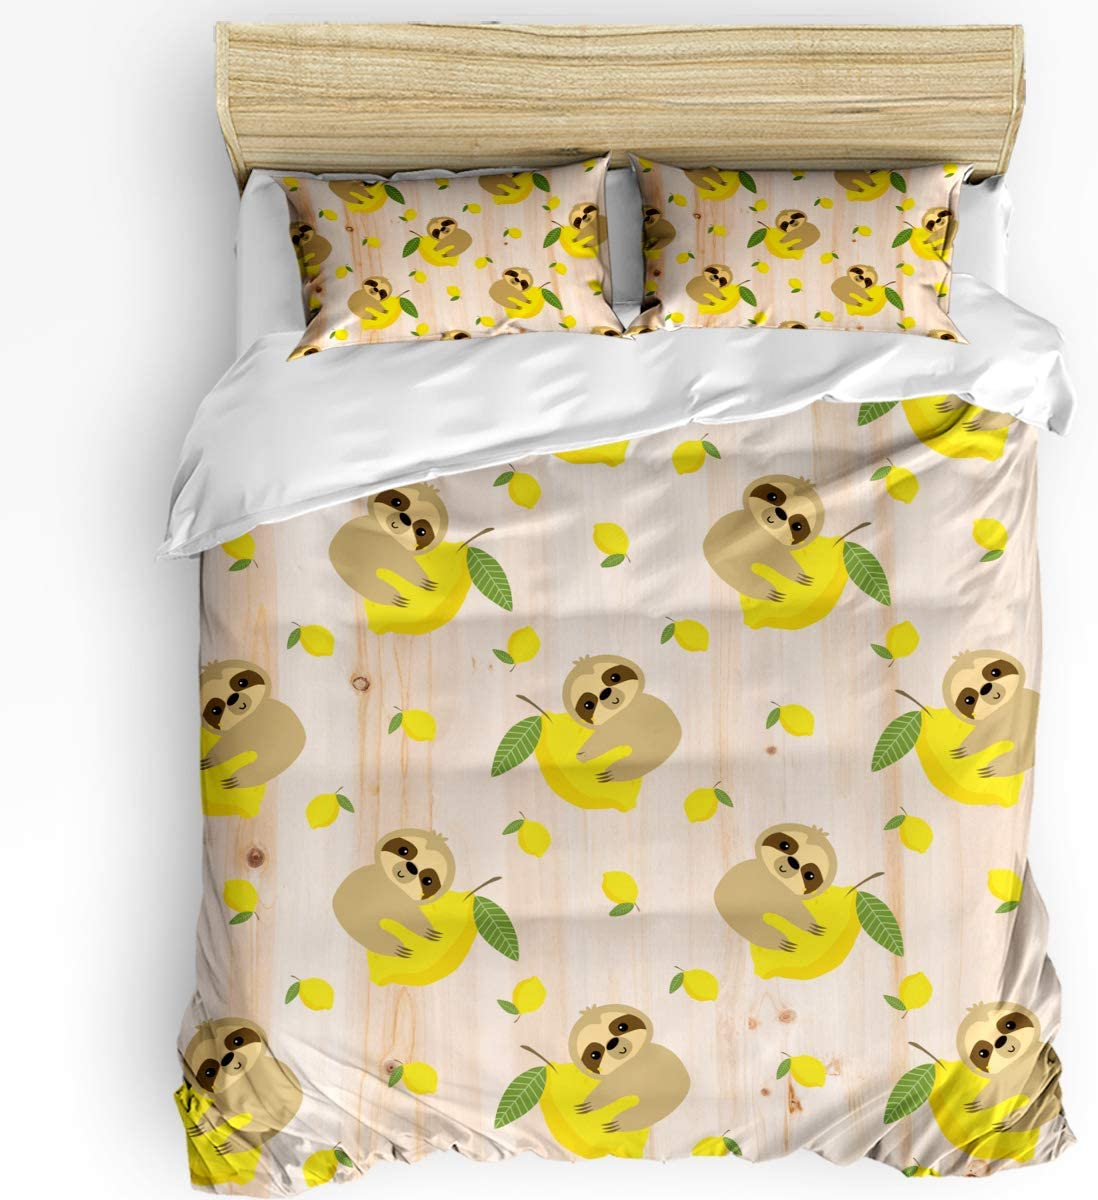 Teather 3-Piece Bedding Sets Sloth with Comforter ! Super beauty product restock quality top! Lemon - Direct store Set Du